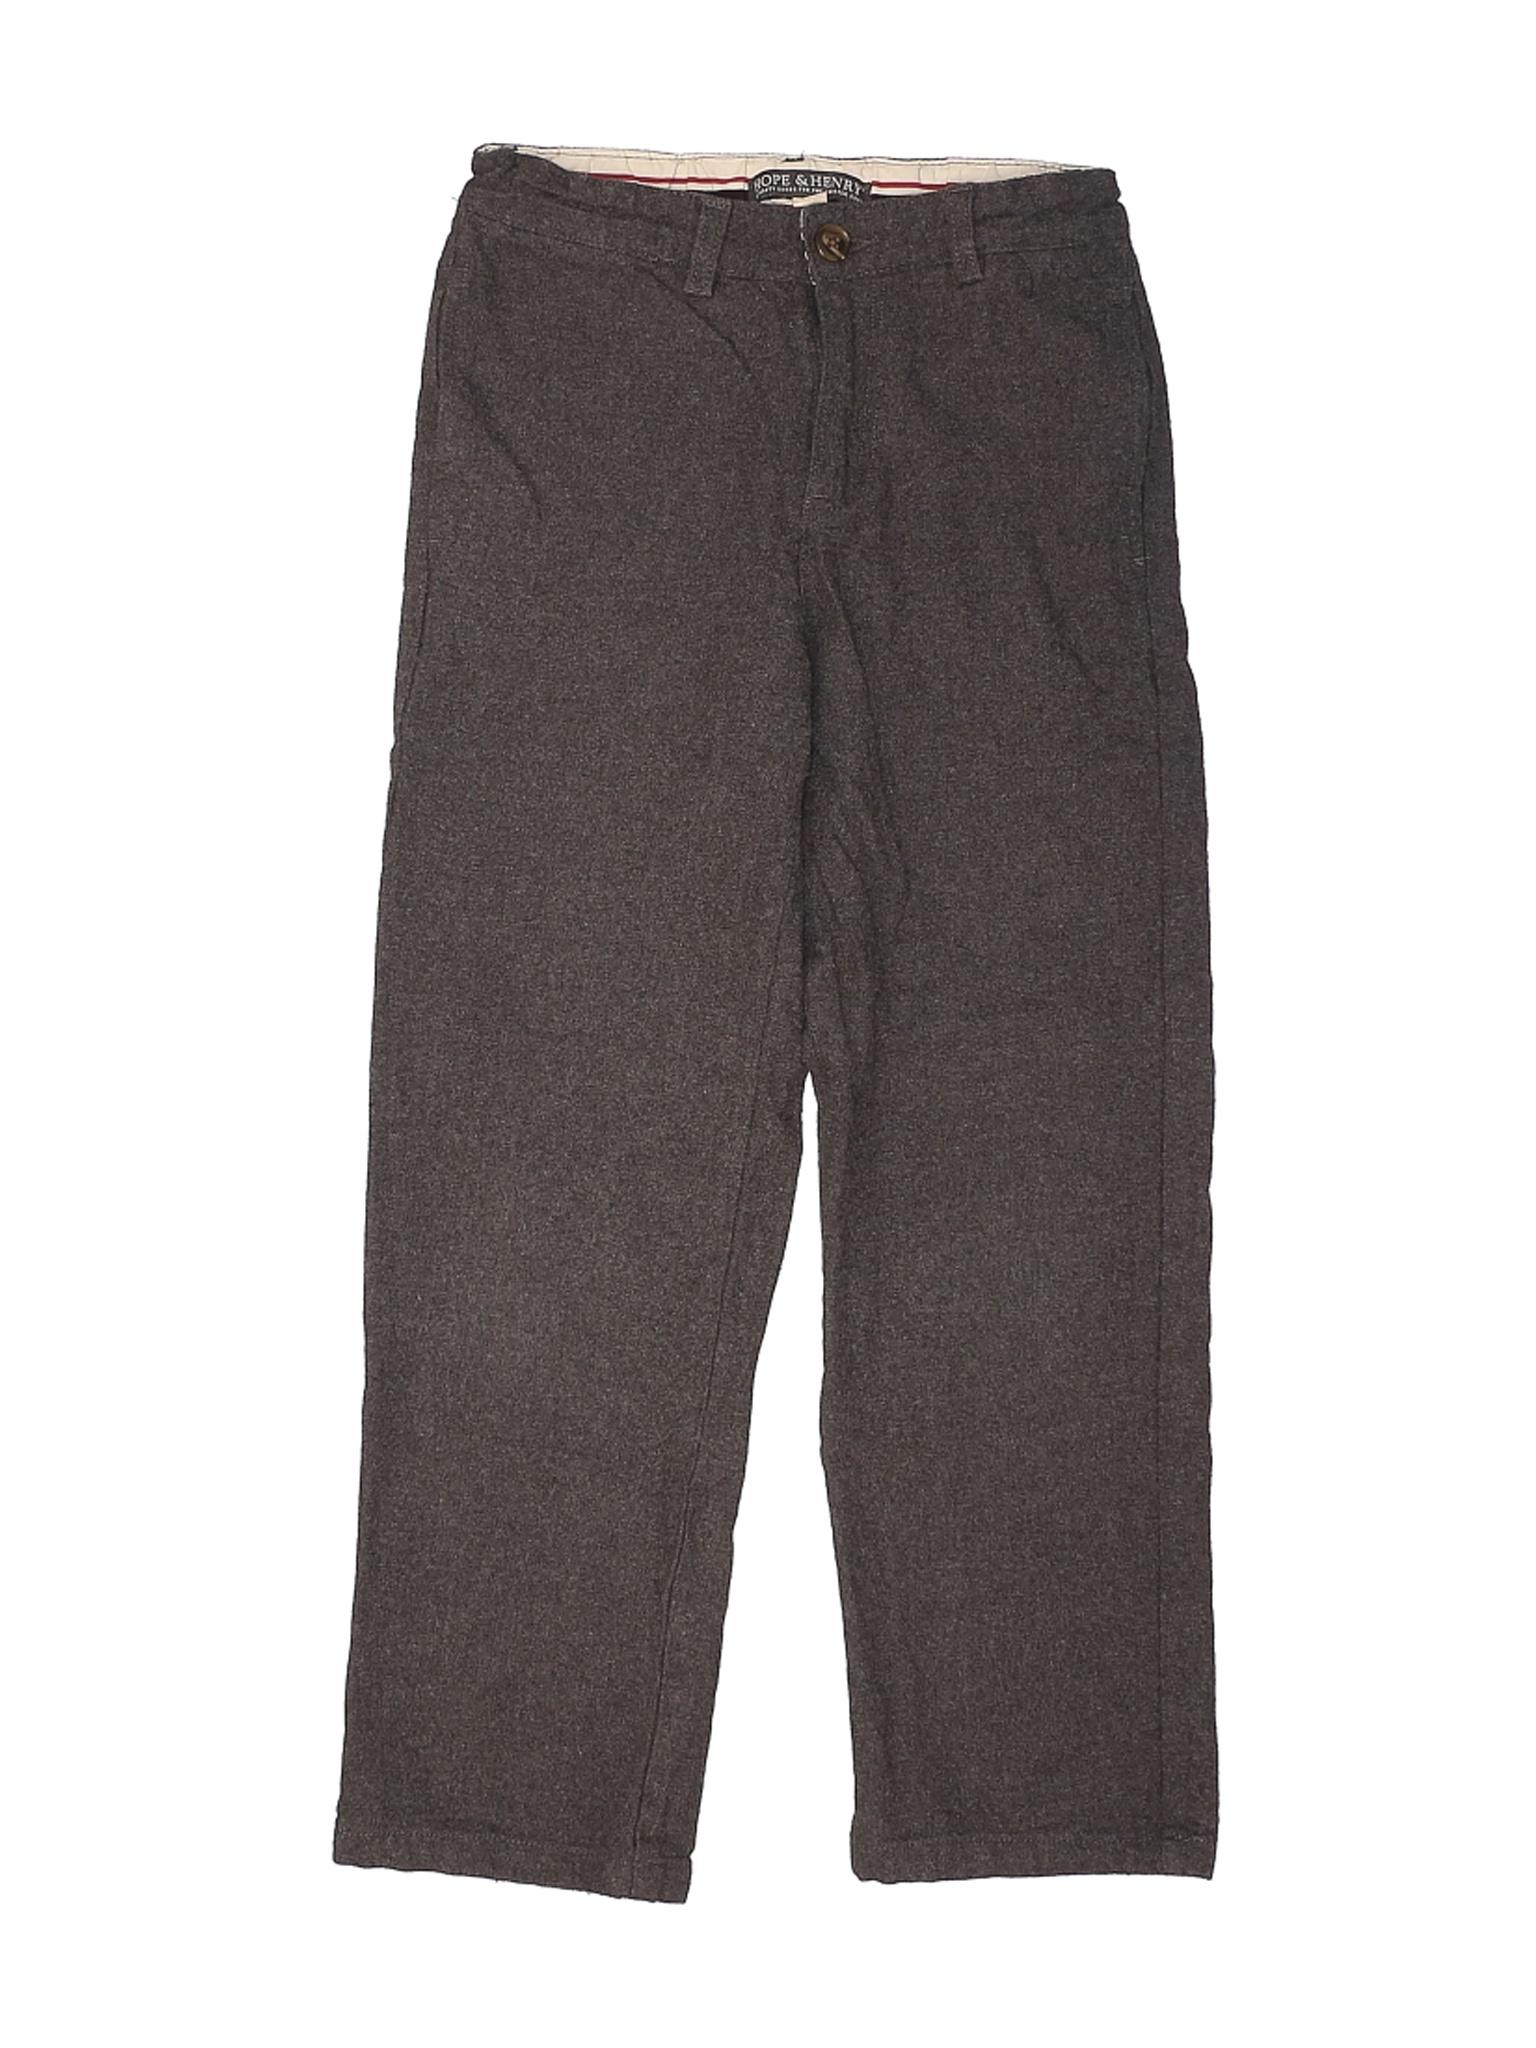 Hope /& Henry Boys Dressy Suit Pant